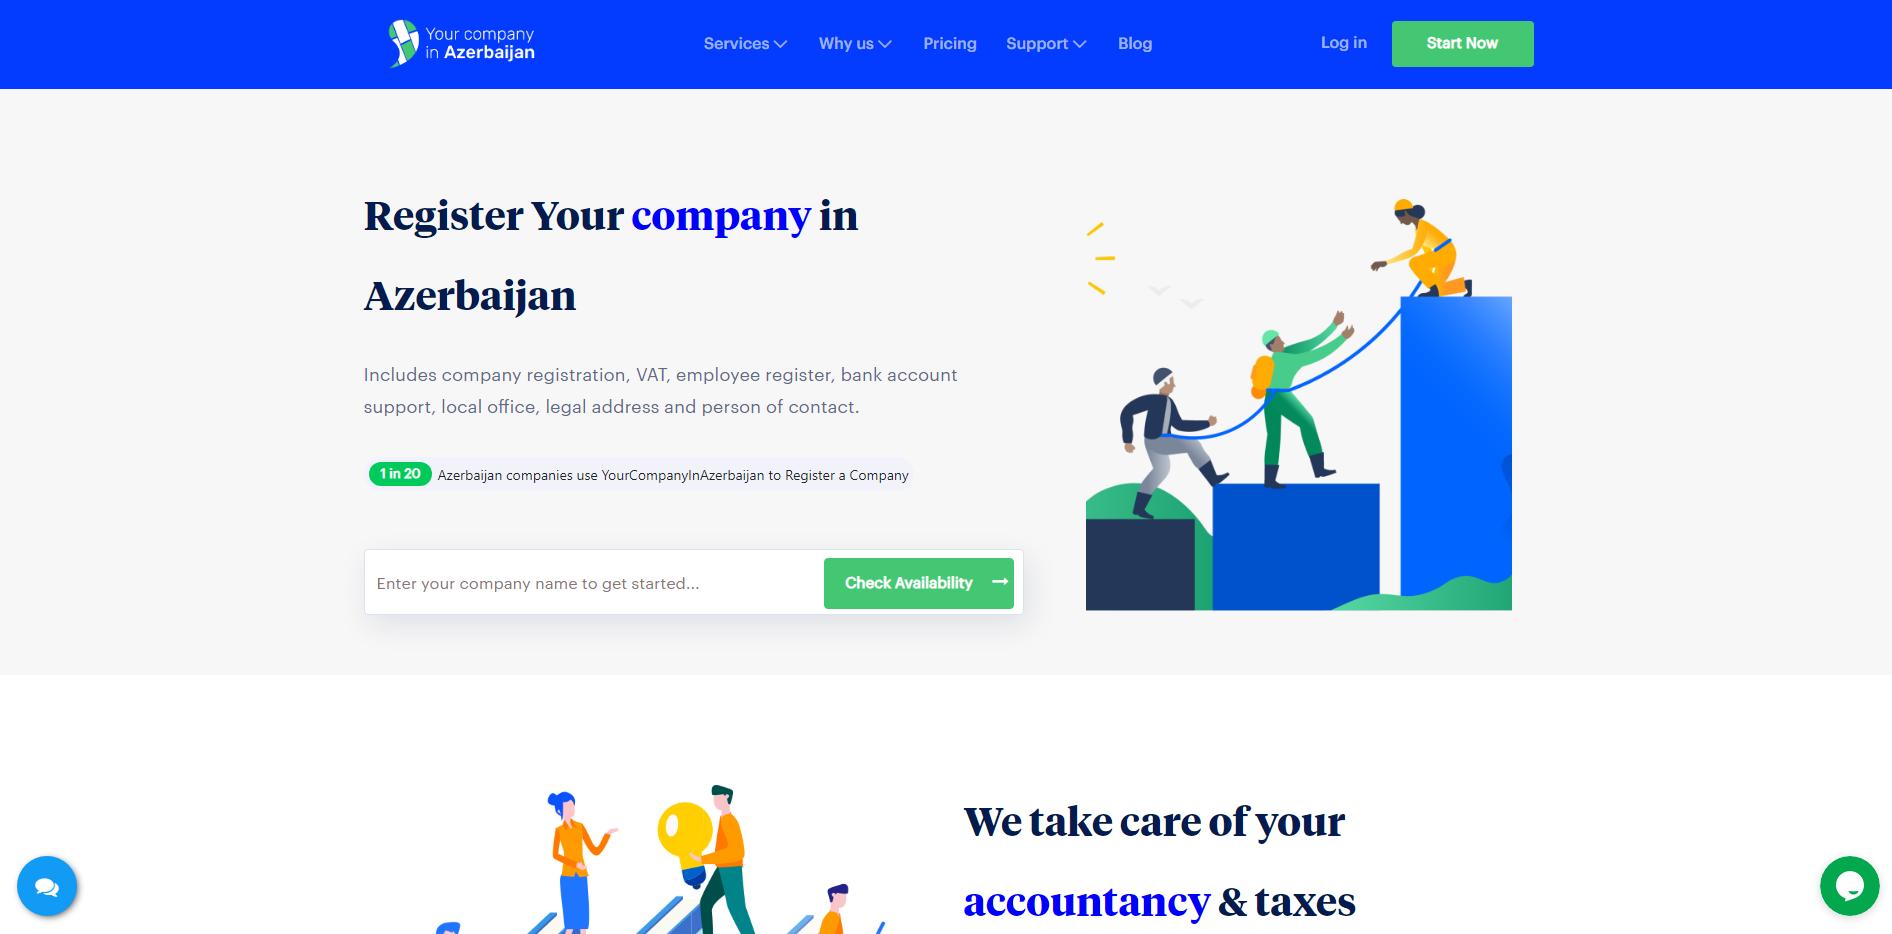 Yourcompanyinazerbaijan.com